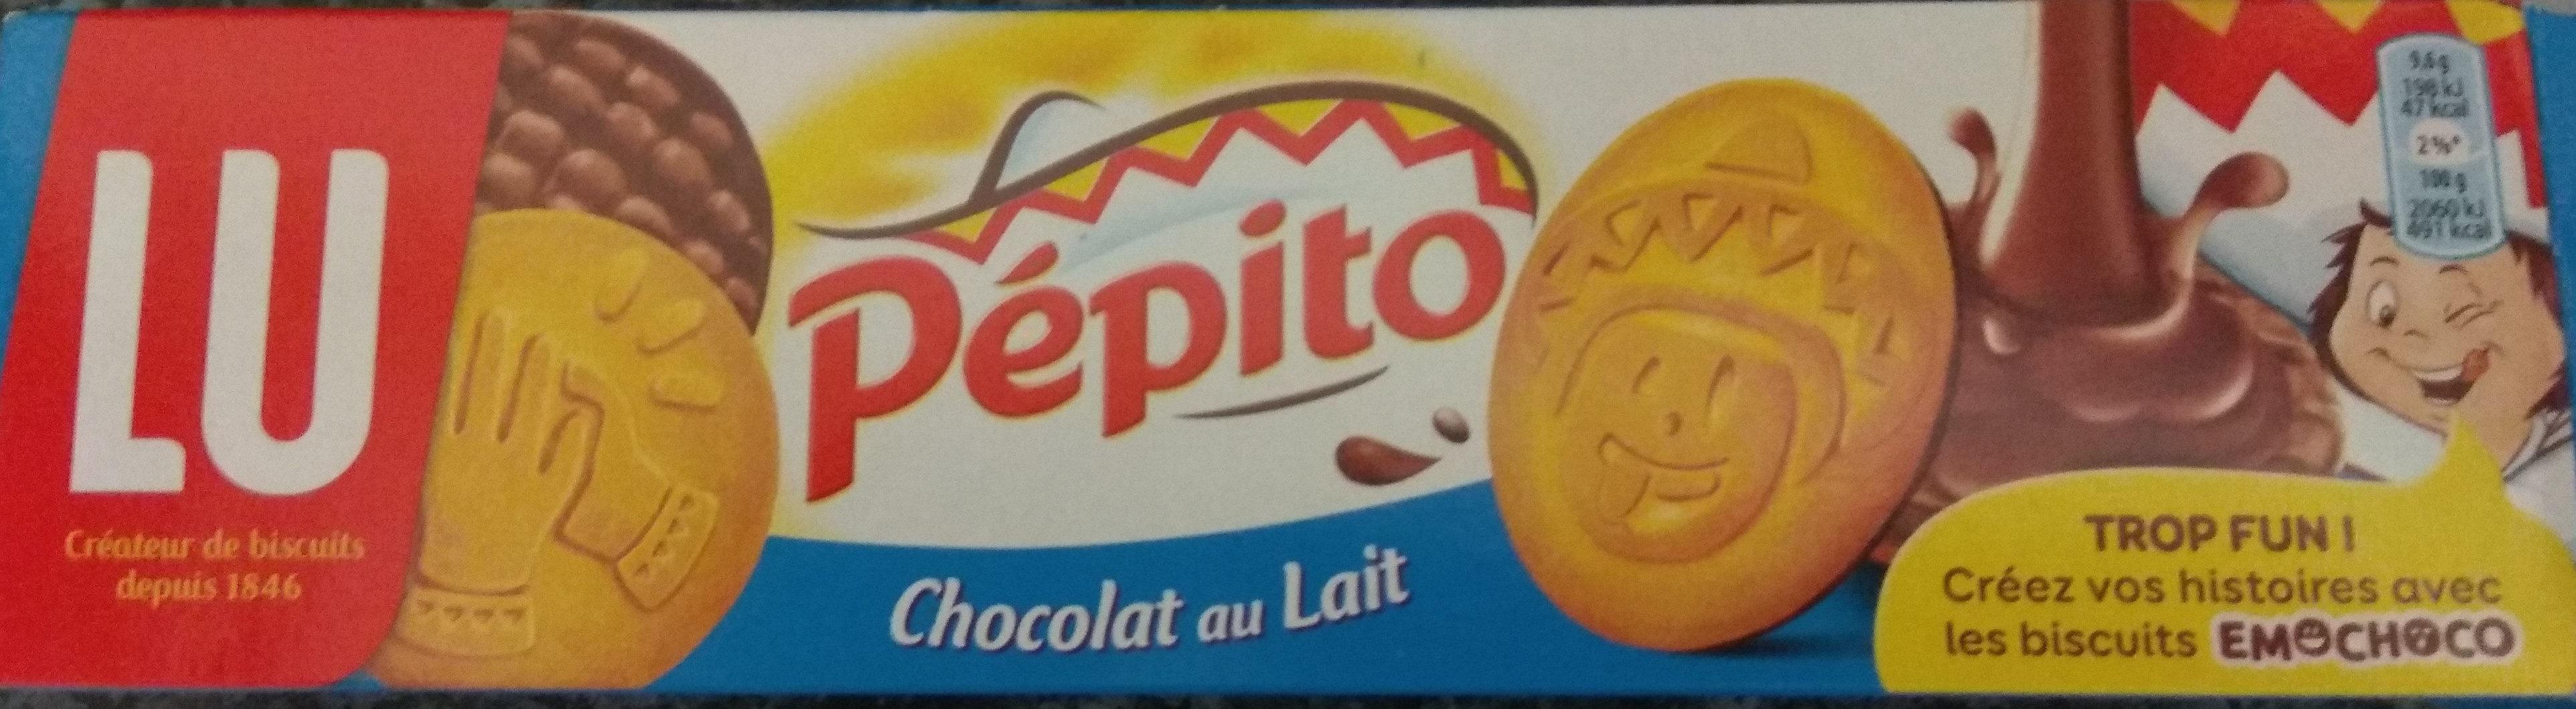 pepito - Produit - fr